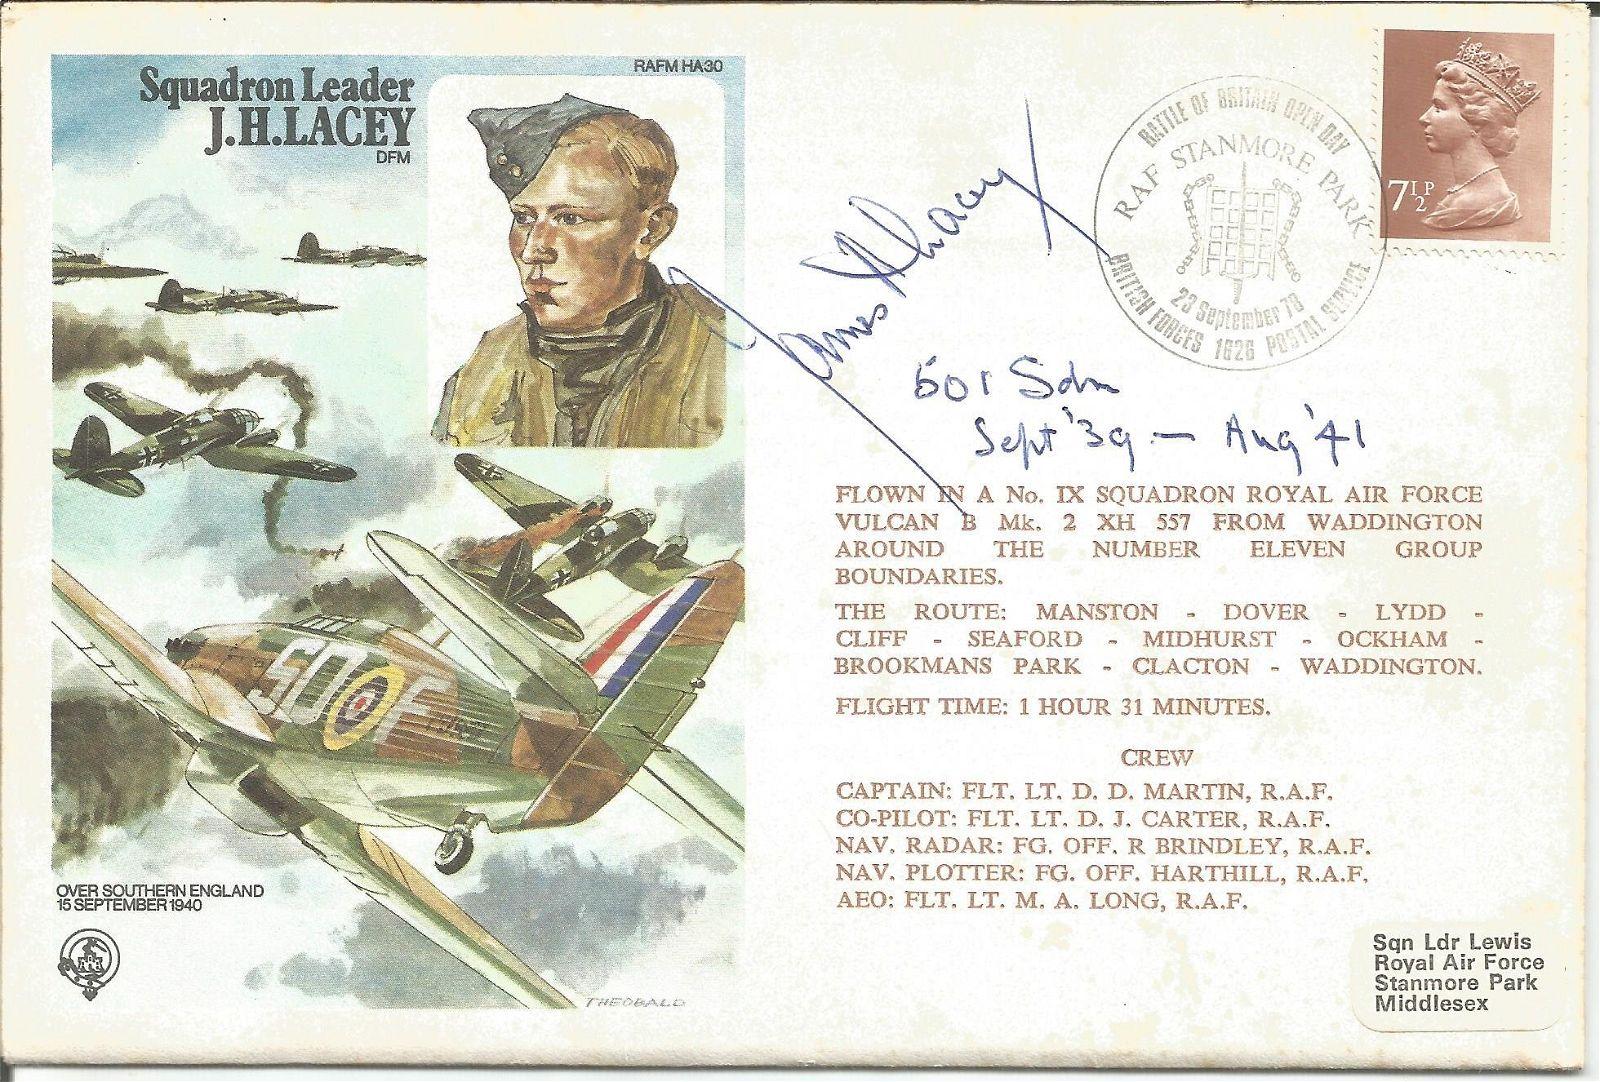 Squadron Leader James Harry Ginger Lacey DFM 601